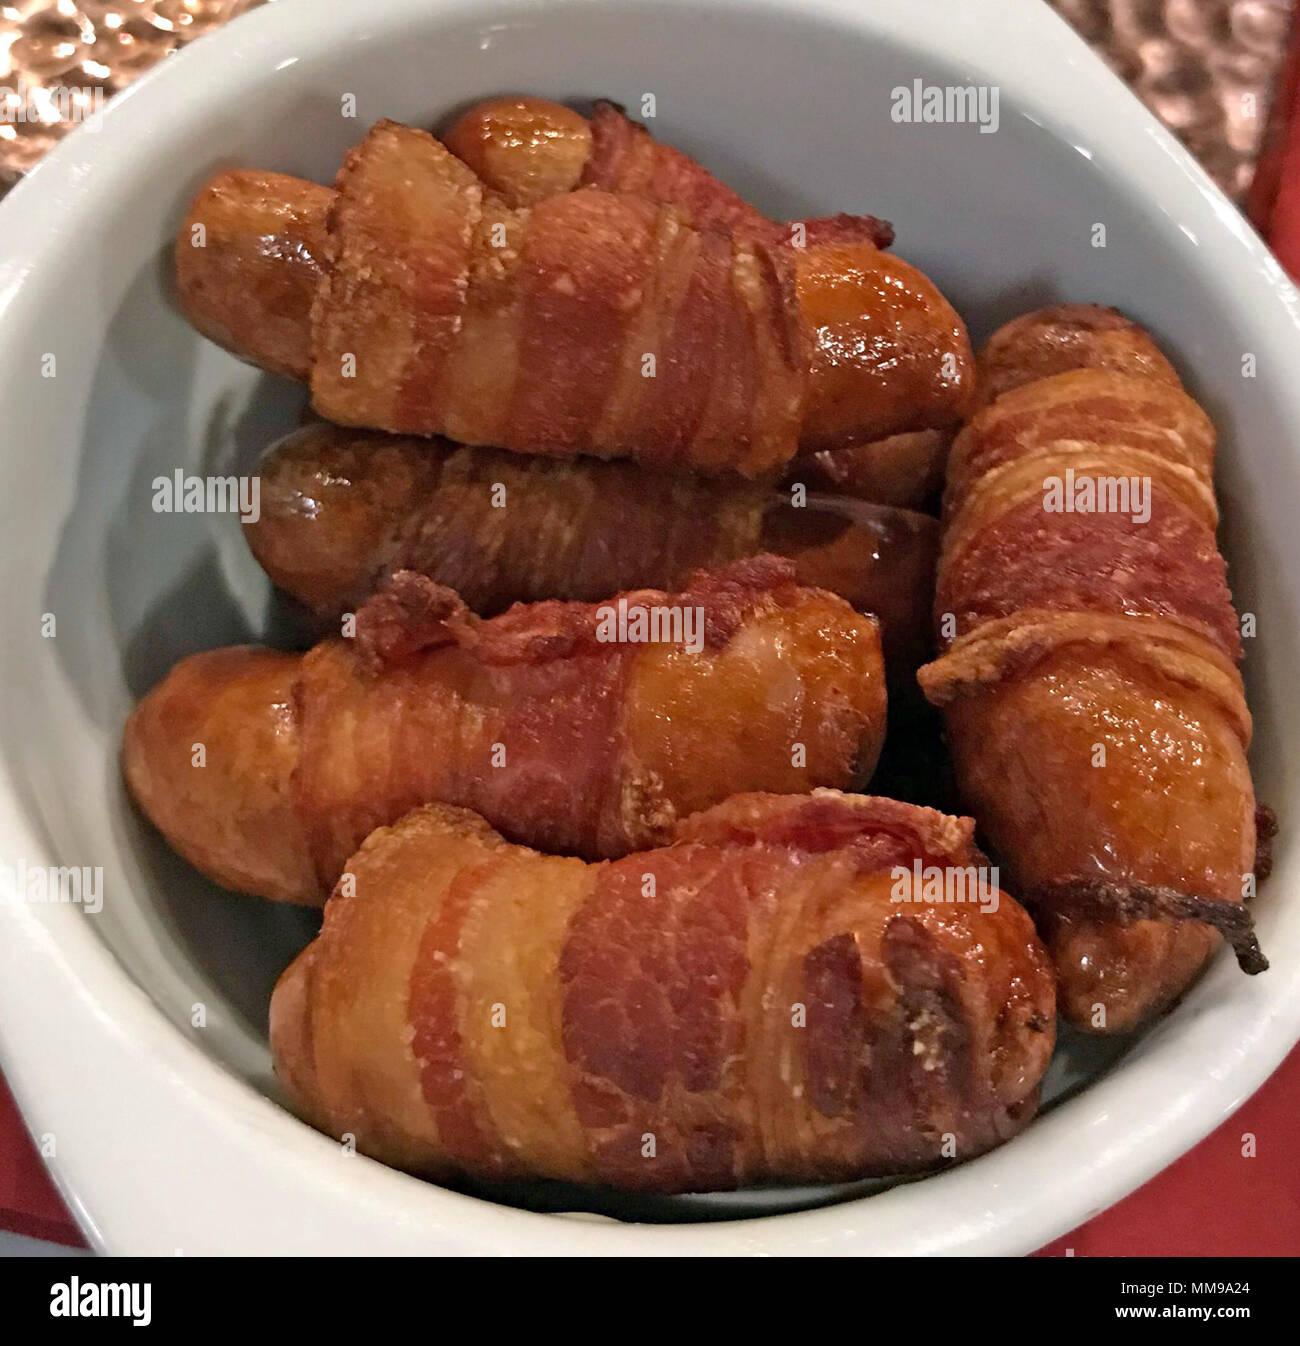 GoTonysmith,@HotpixUK,sausages,wrapped,in,Bacon,Pork